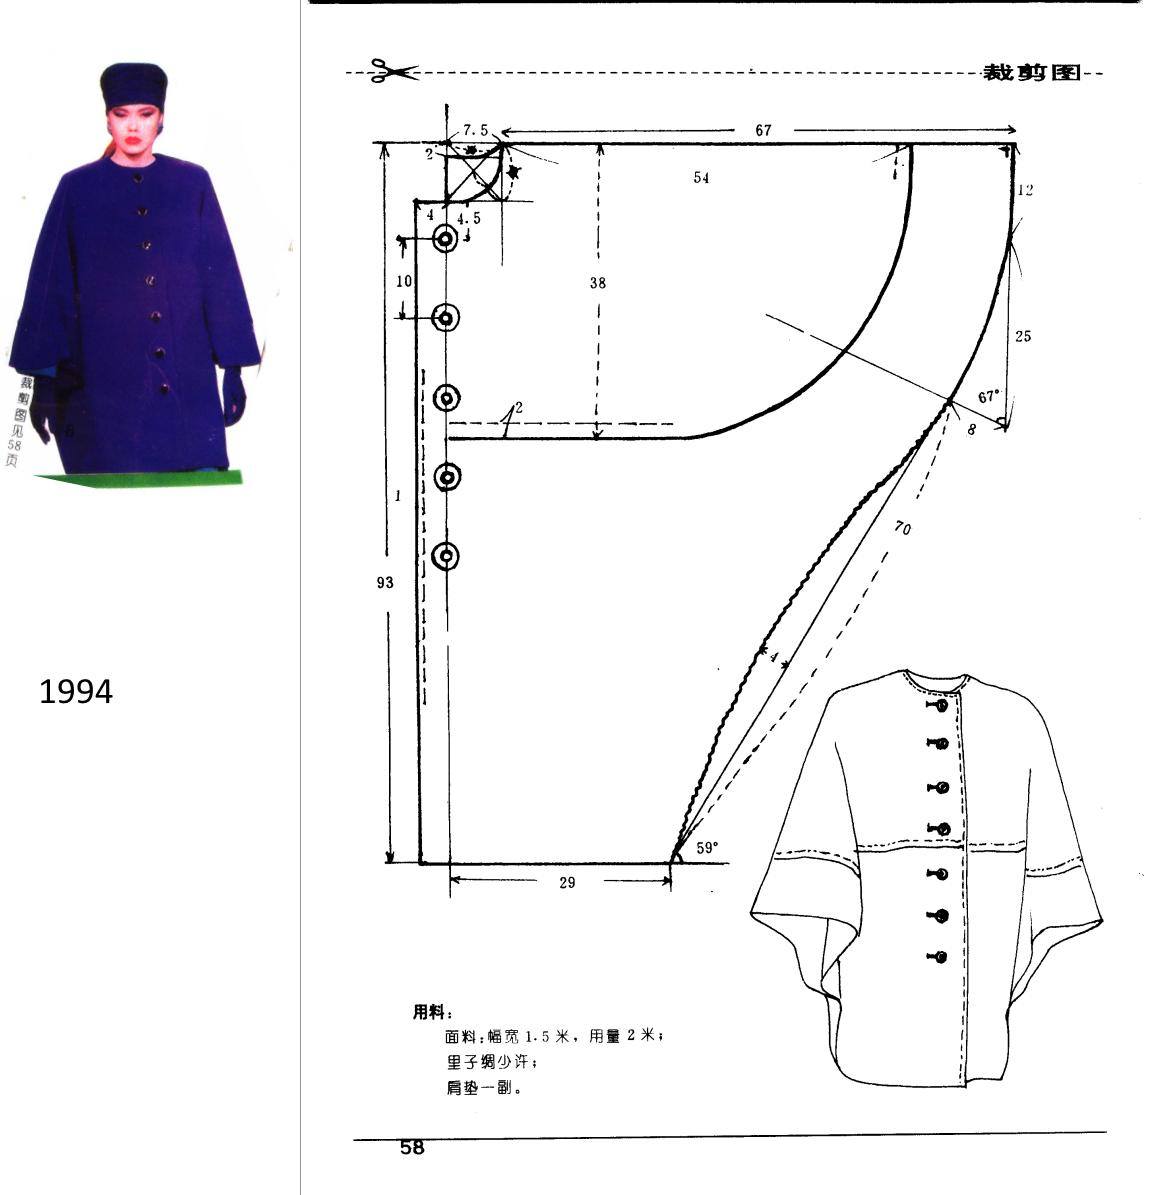 Pin de S B en 옷 | Pinterest | Patrones, Molde y Capilla